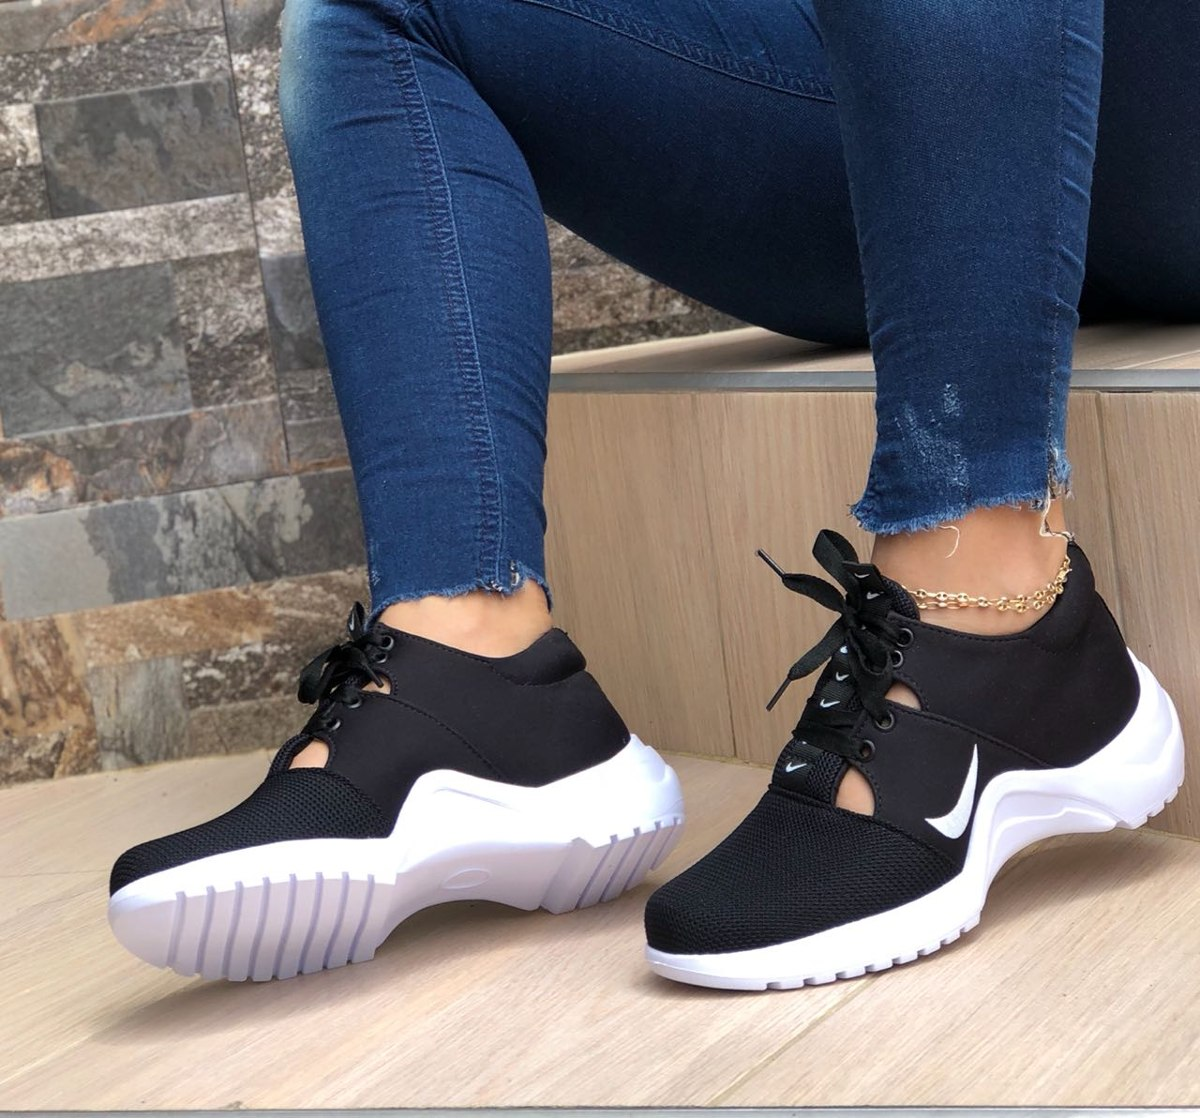 03848010596fb Zapato Tenis Tipo Bota Para Dama Bl Envio Gratis -   85.000 en ...